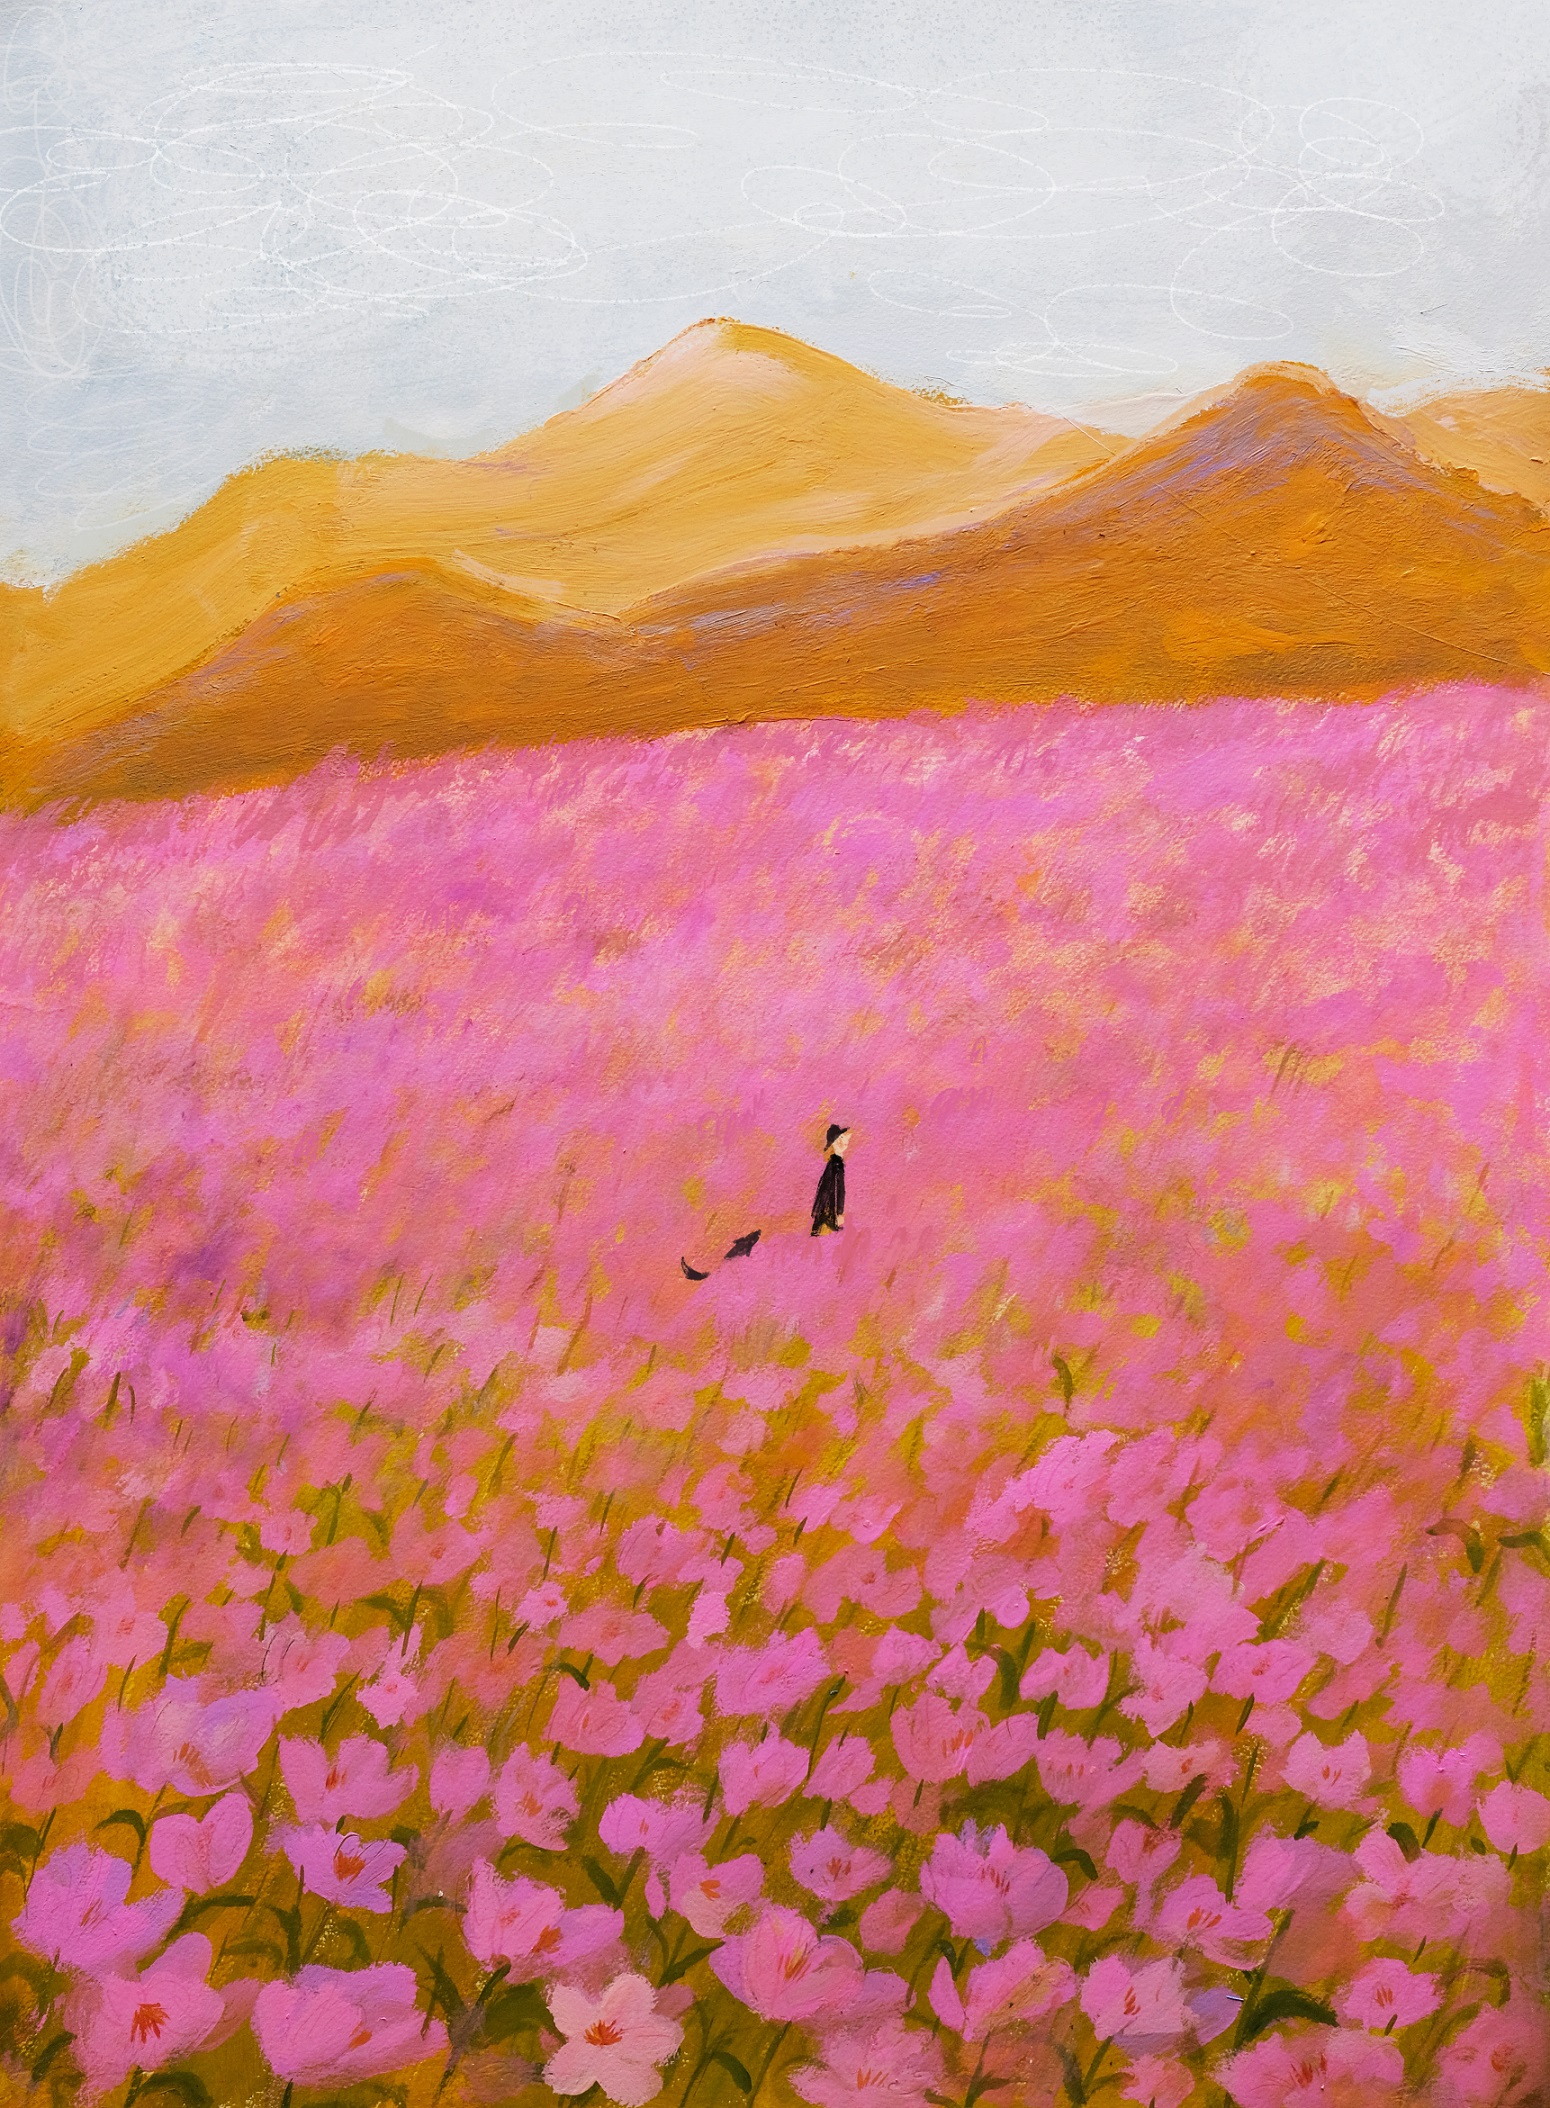 Chilean desert, 2015 ⓒ Oamul Lu